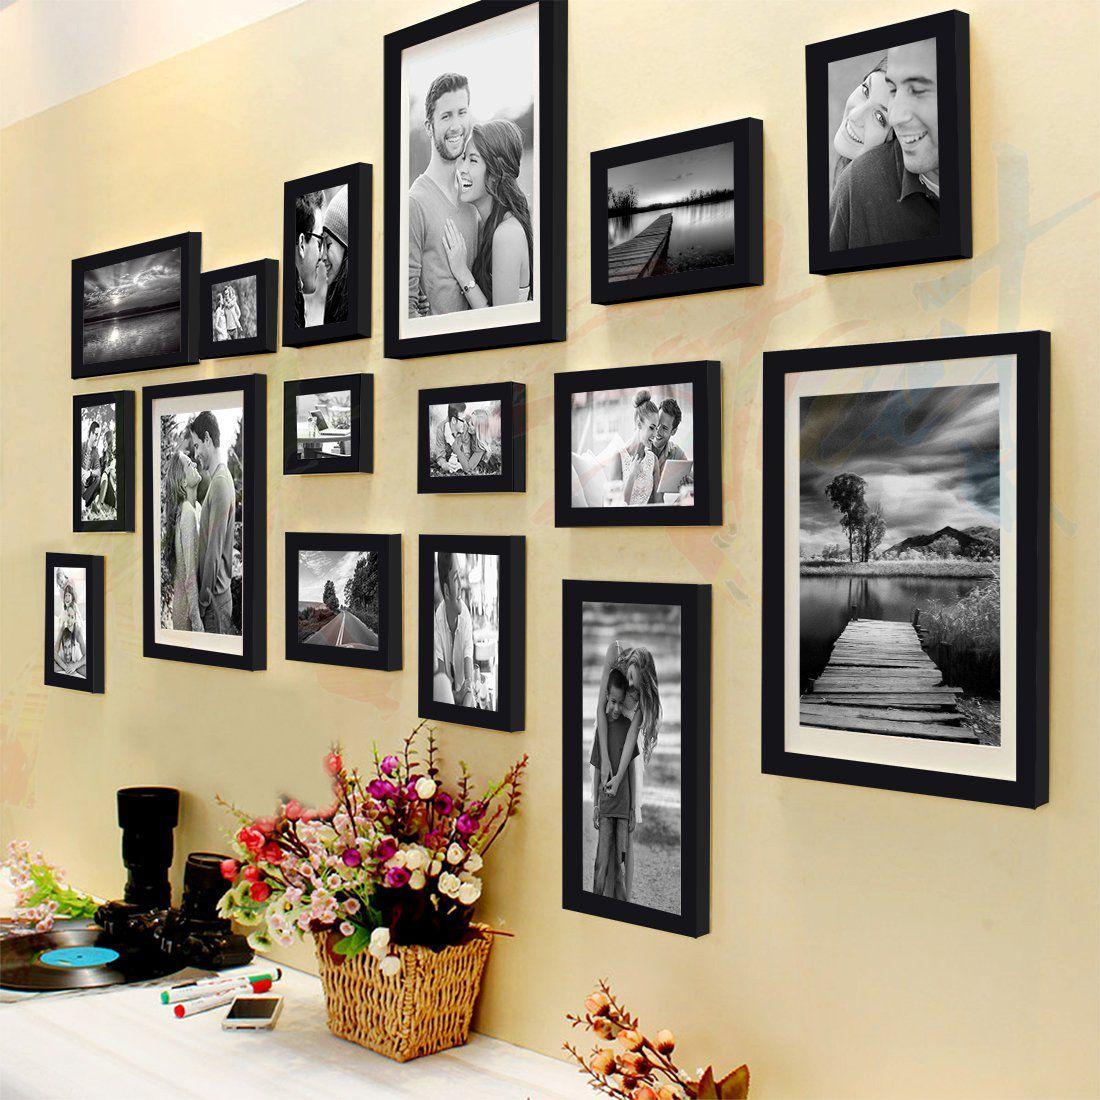 Art Street Shooting Star Photo Frame Set of 16 Individual Photo Frames